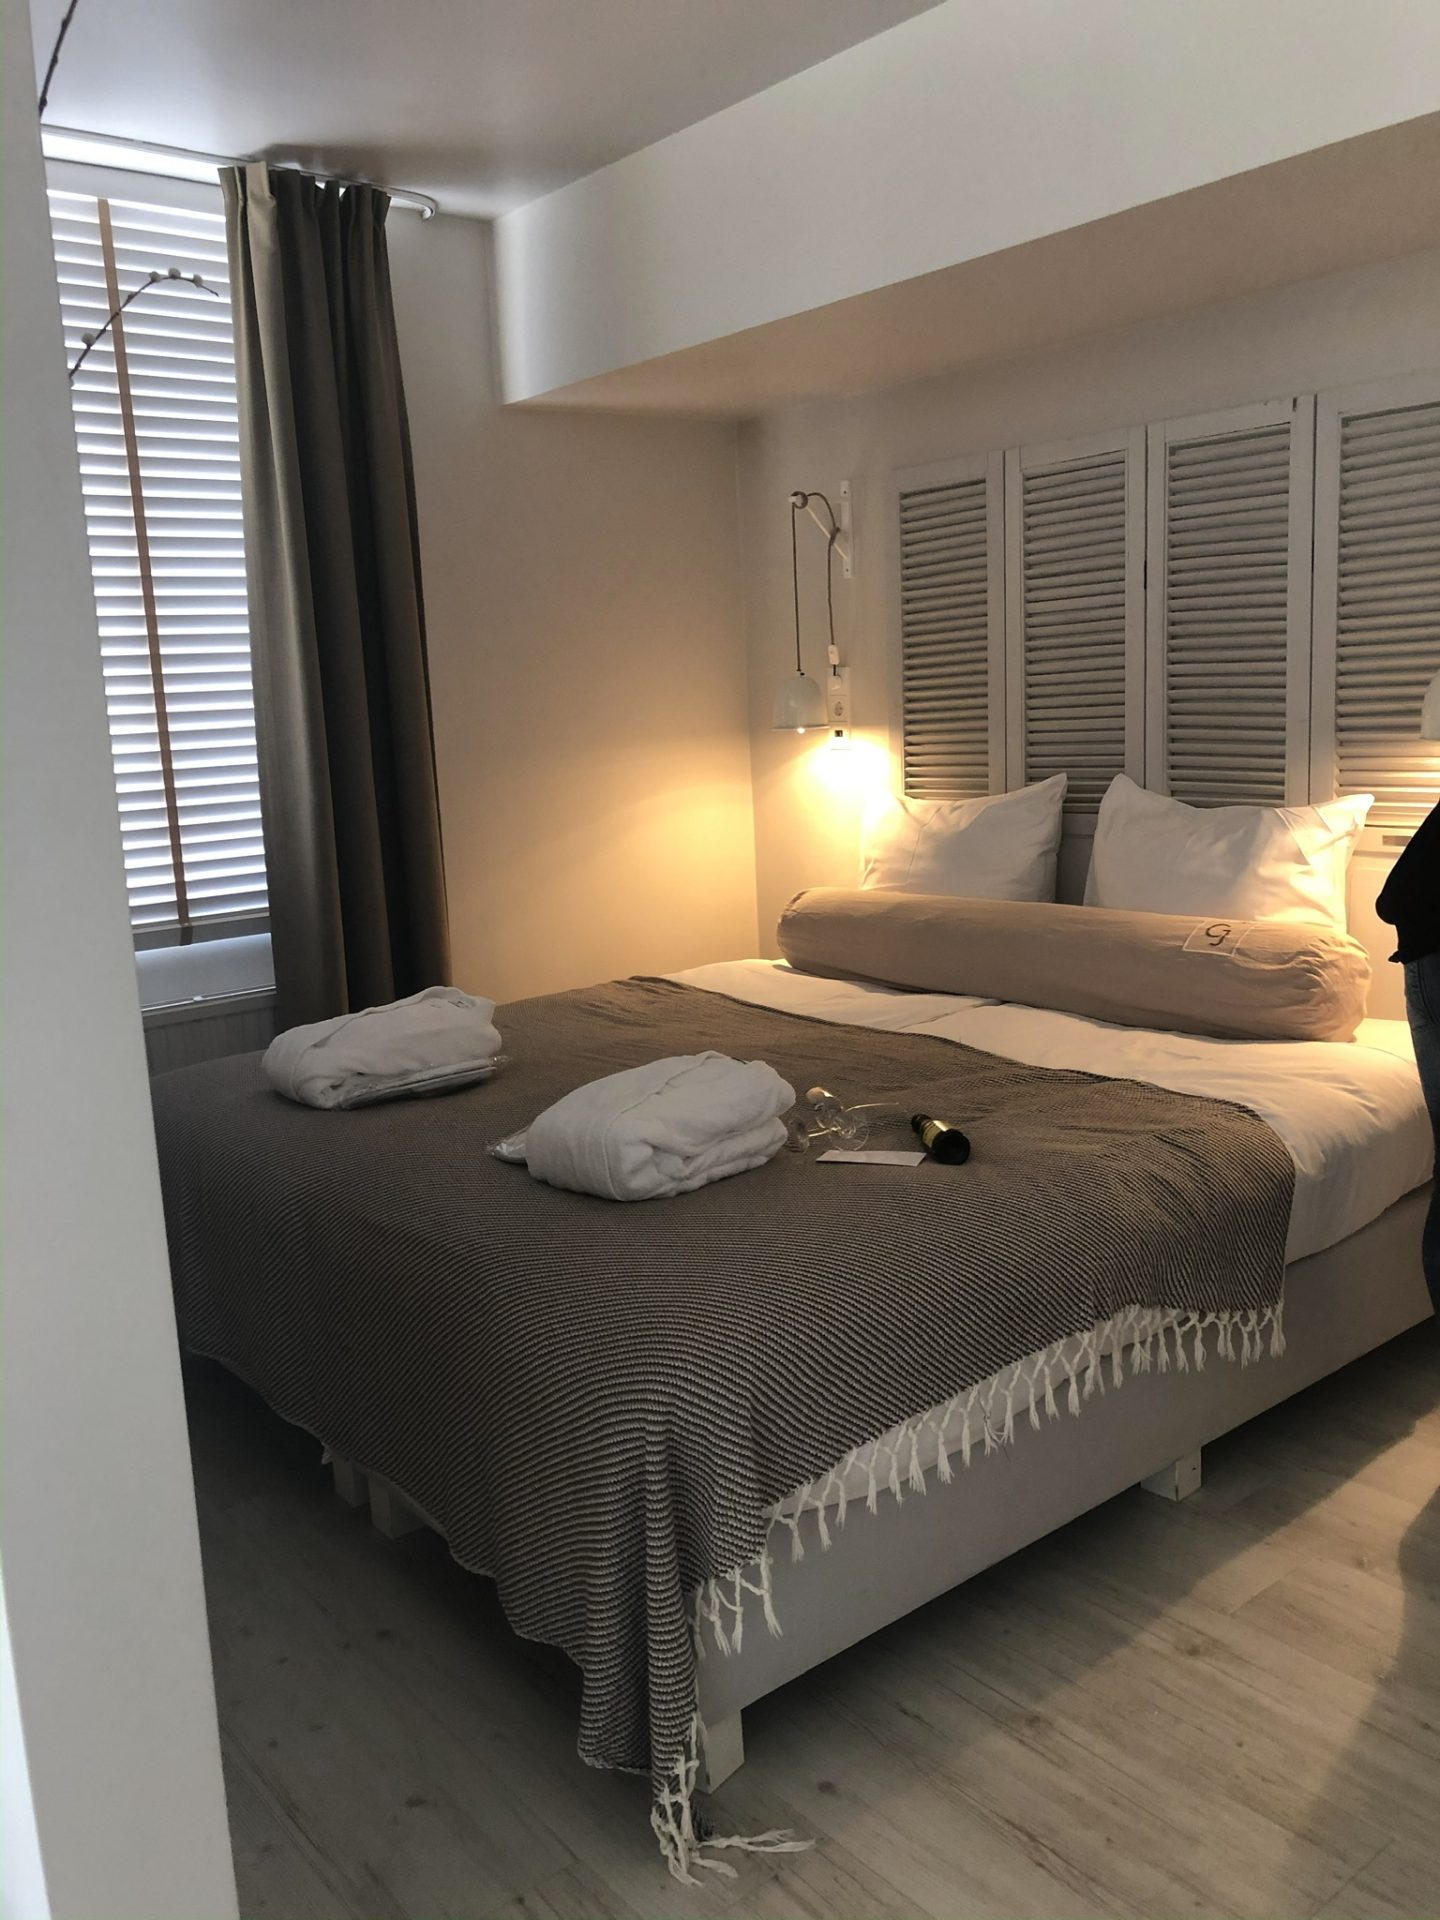 weekendje weg, weekend, vakantie, hotel, hotels, hotels.nl, casa julie, hotel juliana, xmariekie, reisblogger